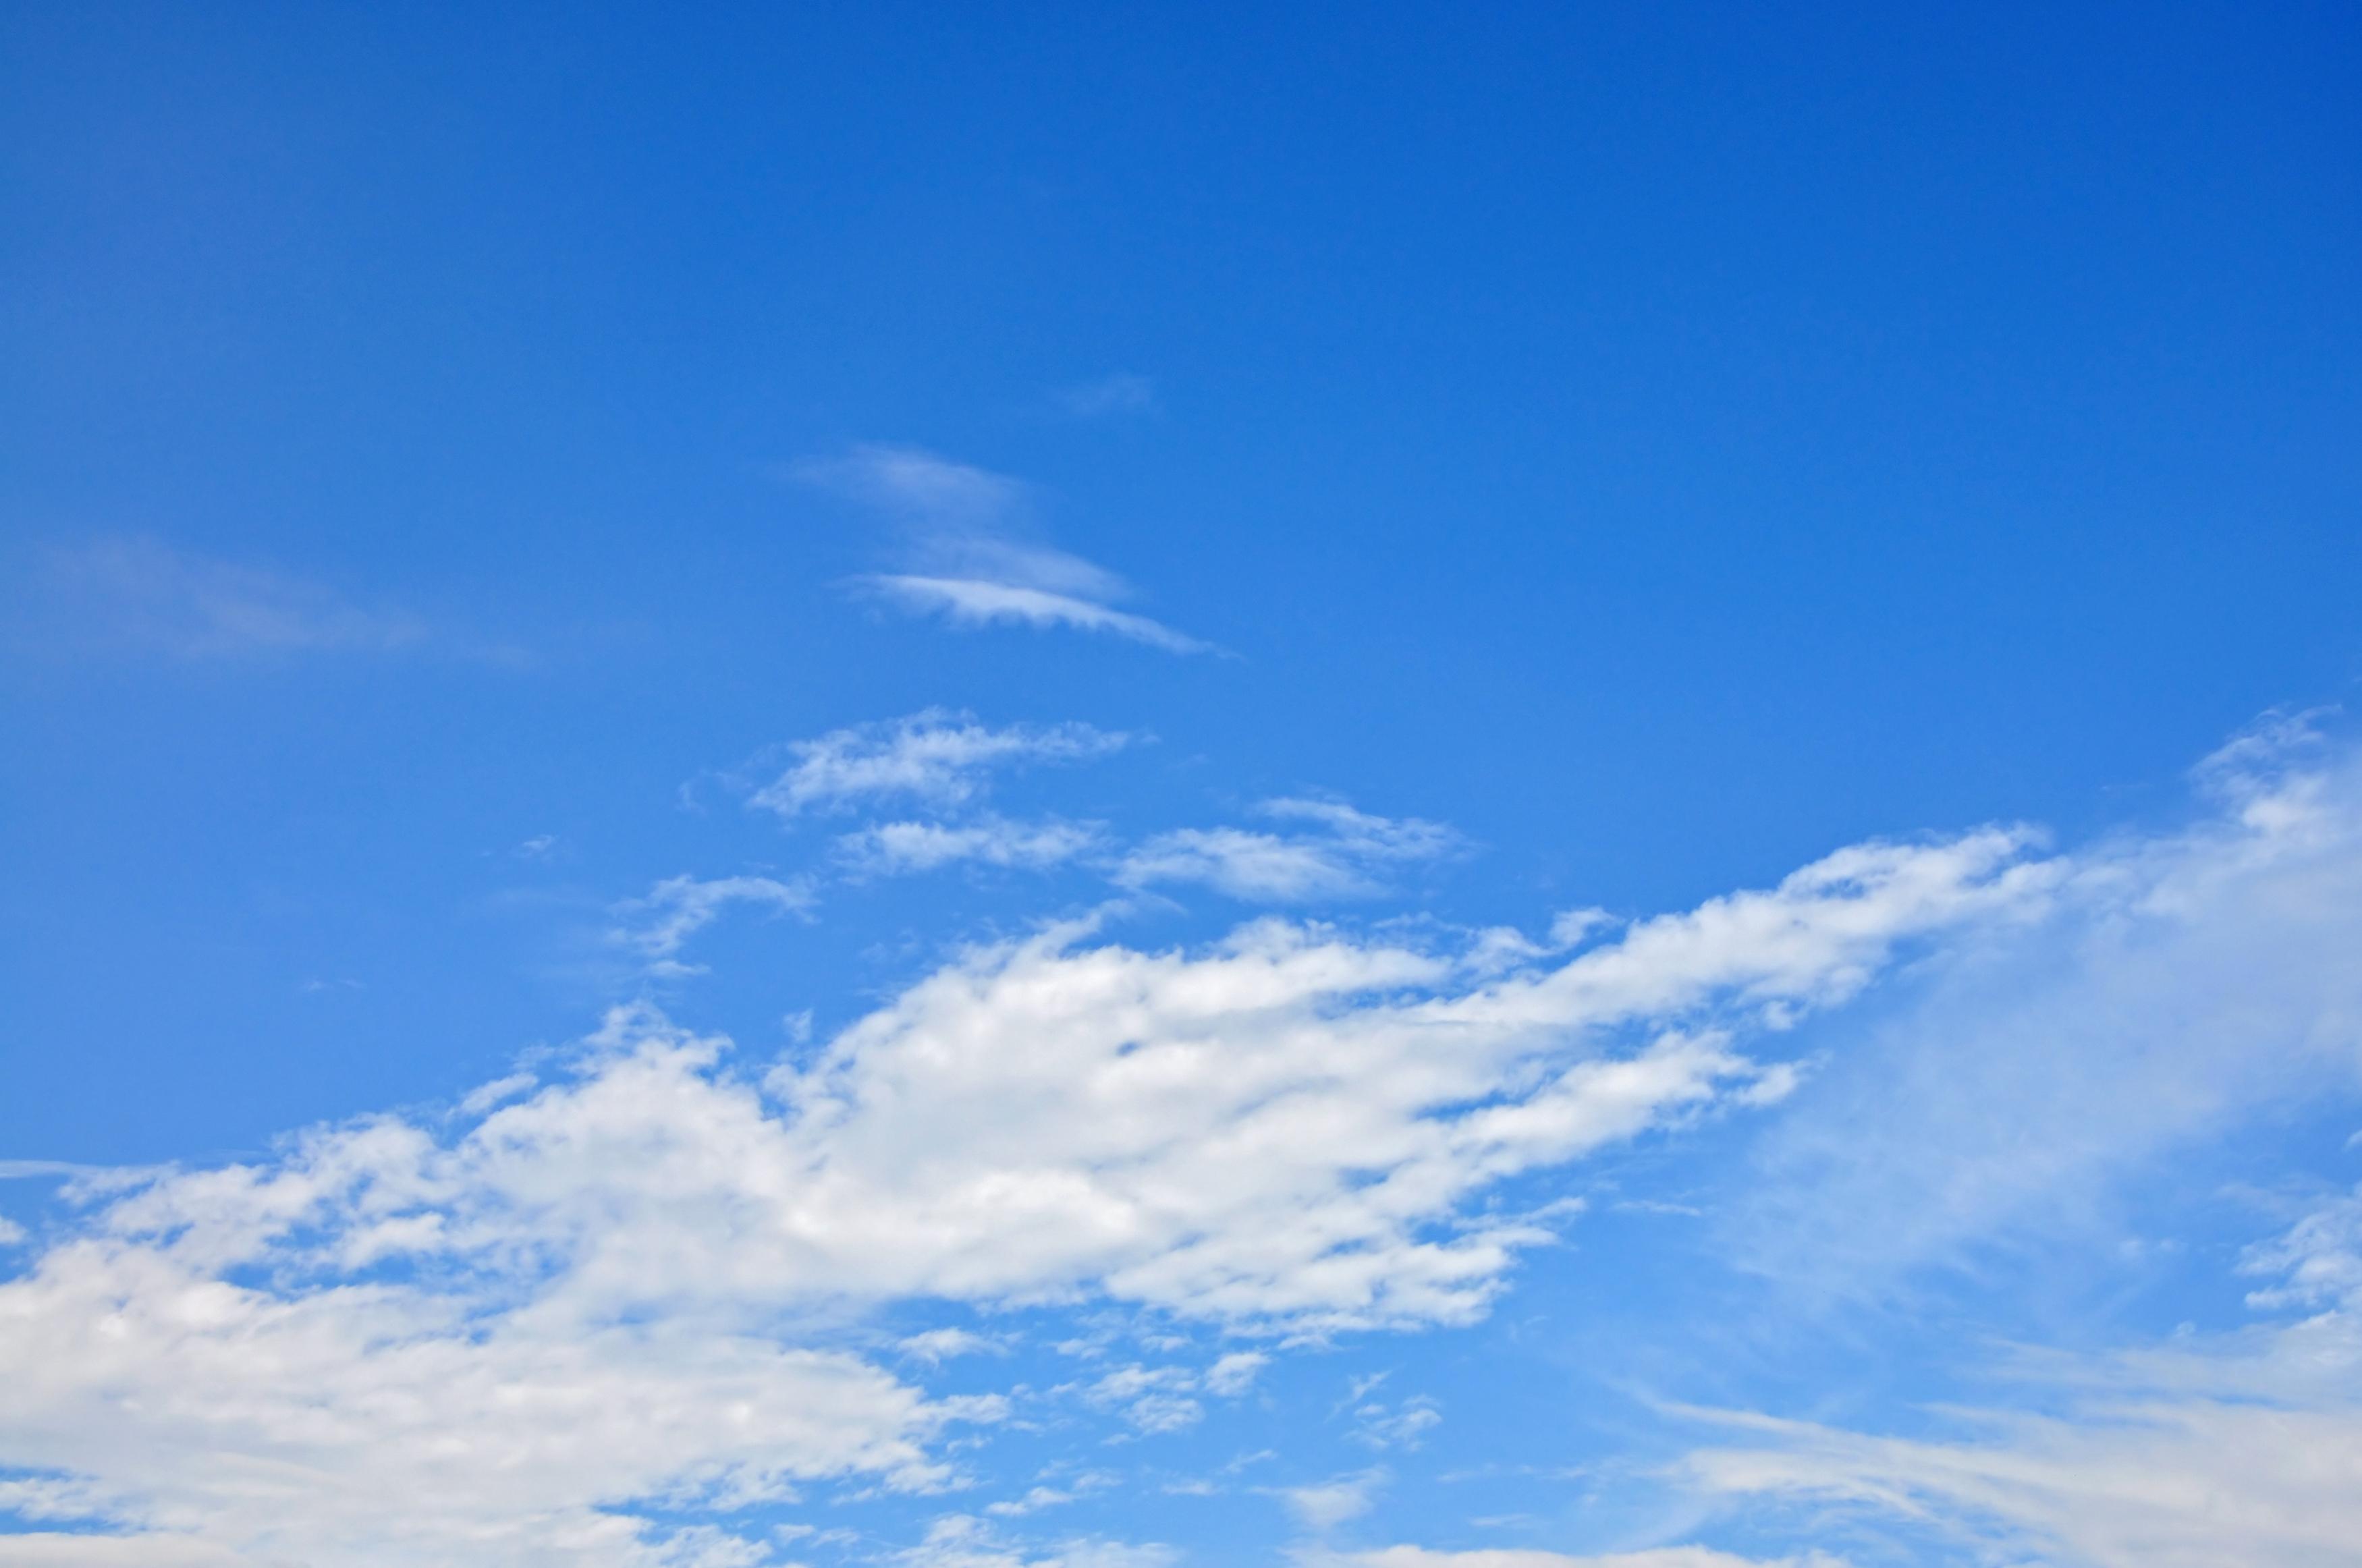 File:Stratocumulus-cylinders.jpg - Wikipedia |Stratocumulus Clouds Description